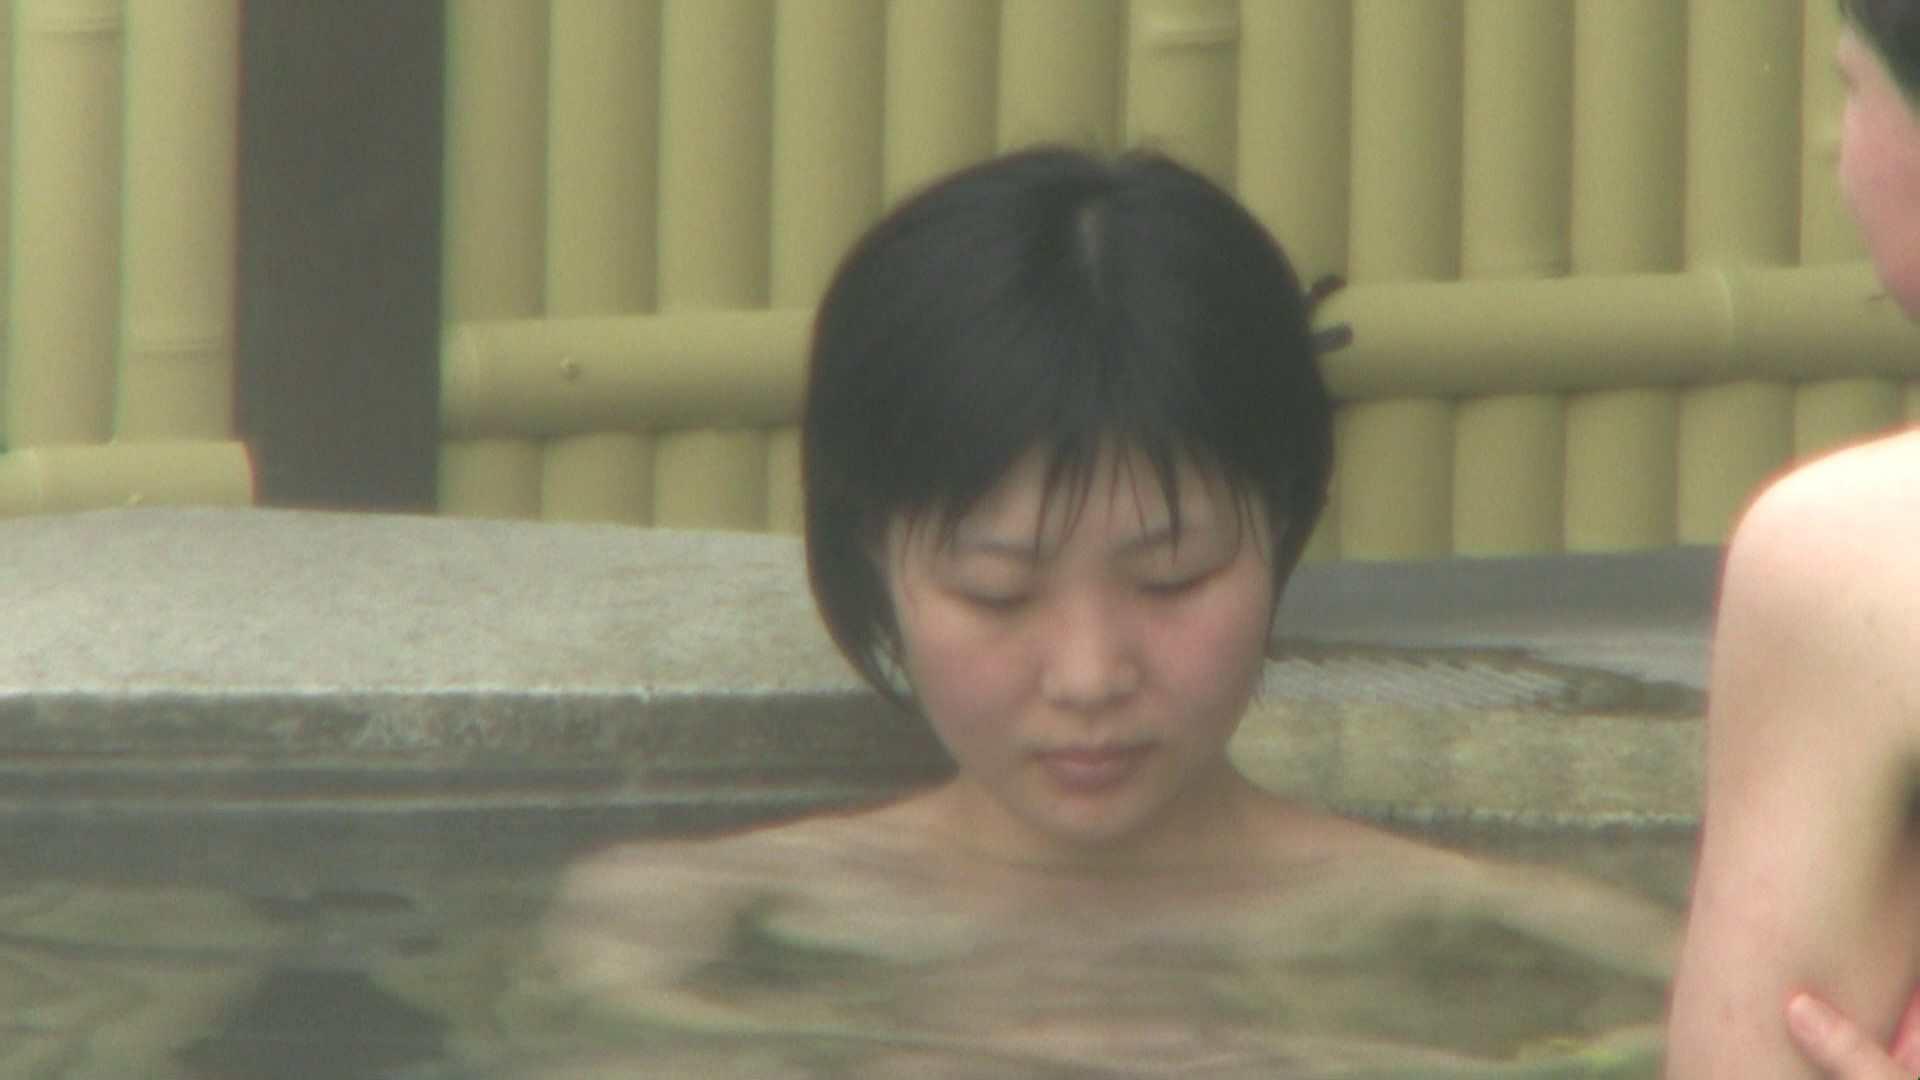 Aquaな露天風呂Vol.74【VIP限定】 盗撮 隠し撮りオマンコ動画紹介 68画像 53